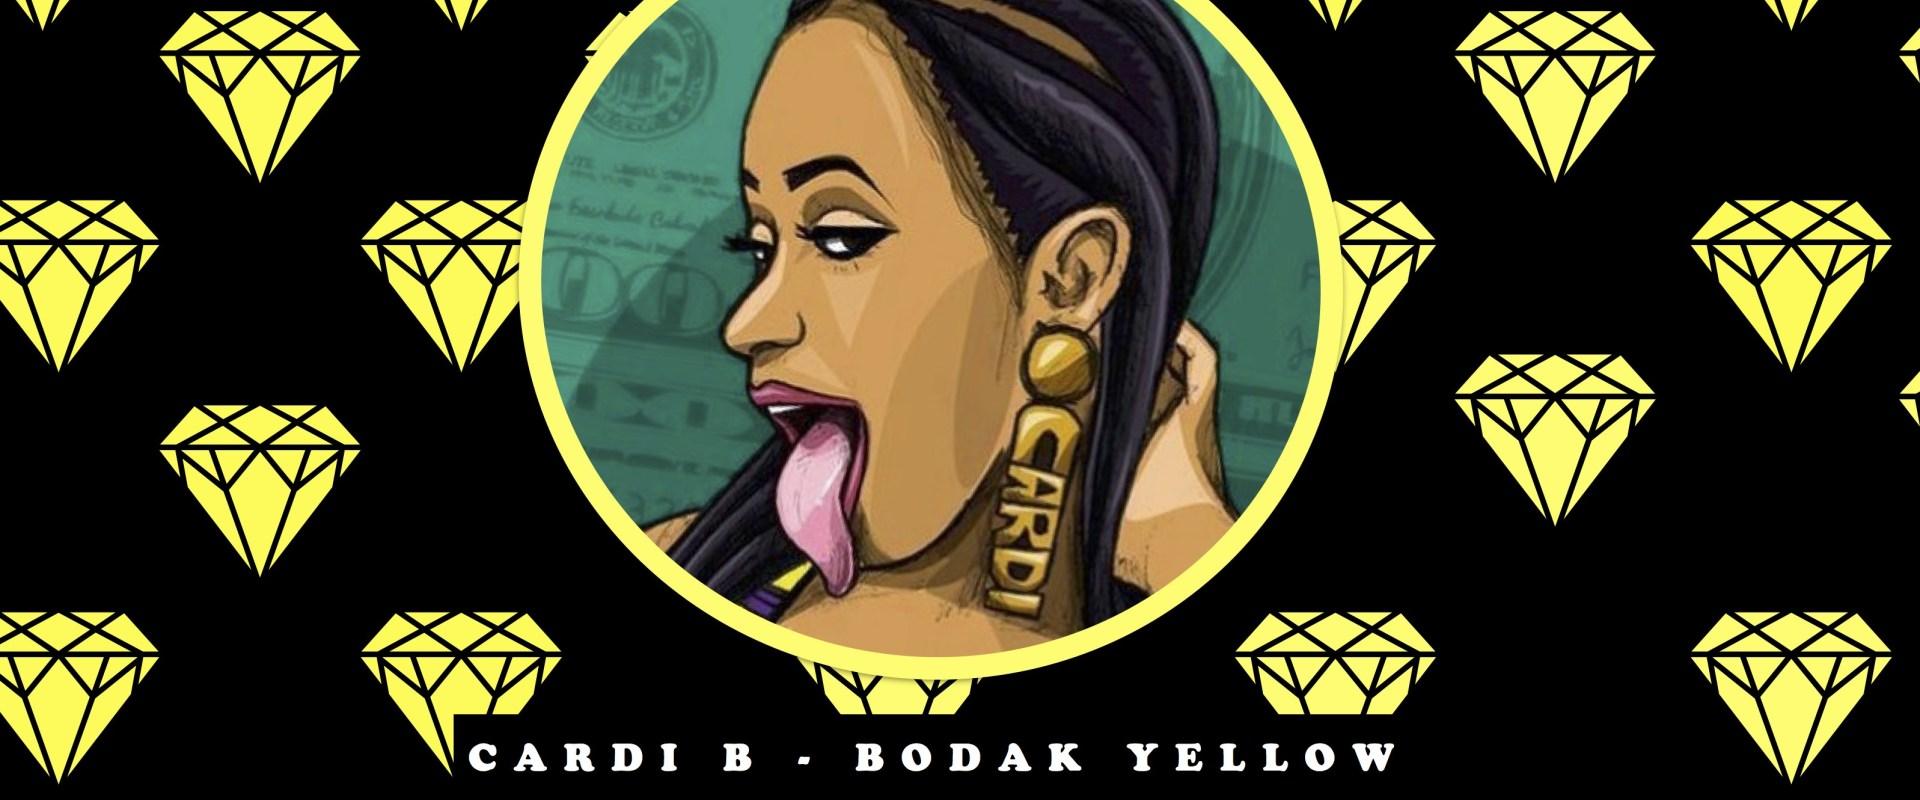 Cardi B Bodak Yellow Ashton McCreight Remix UP IN THE EAR 1920x800